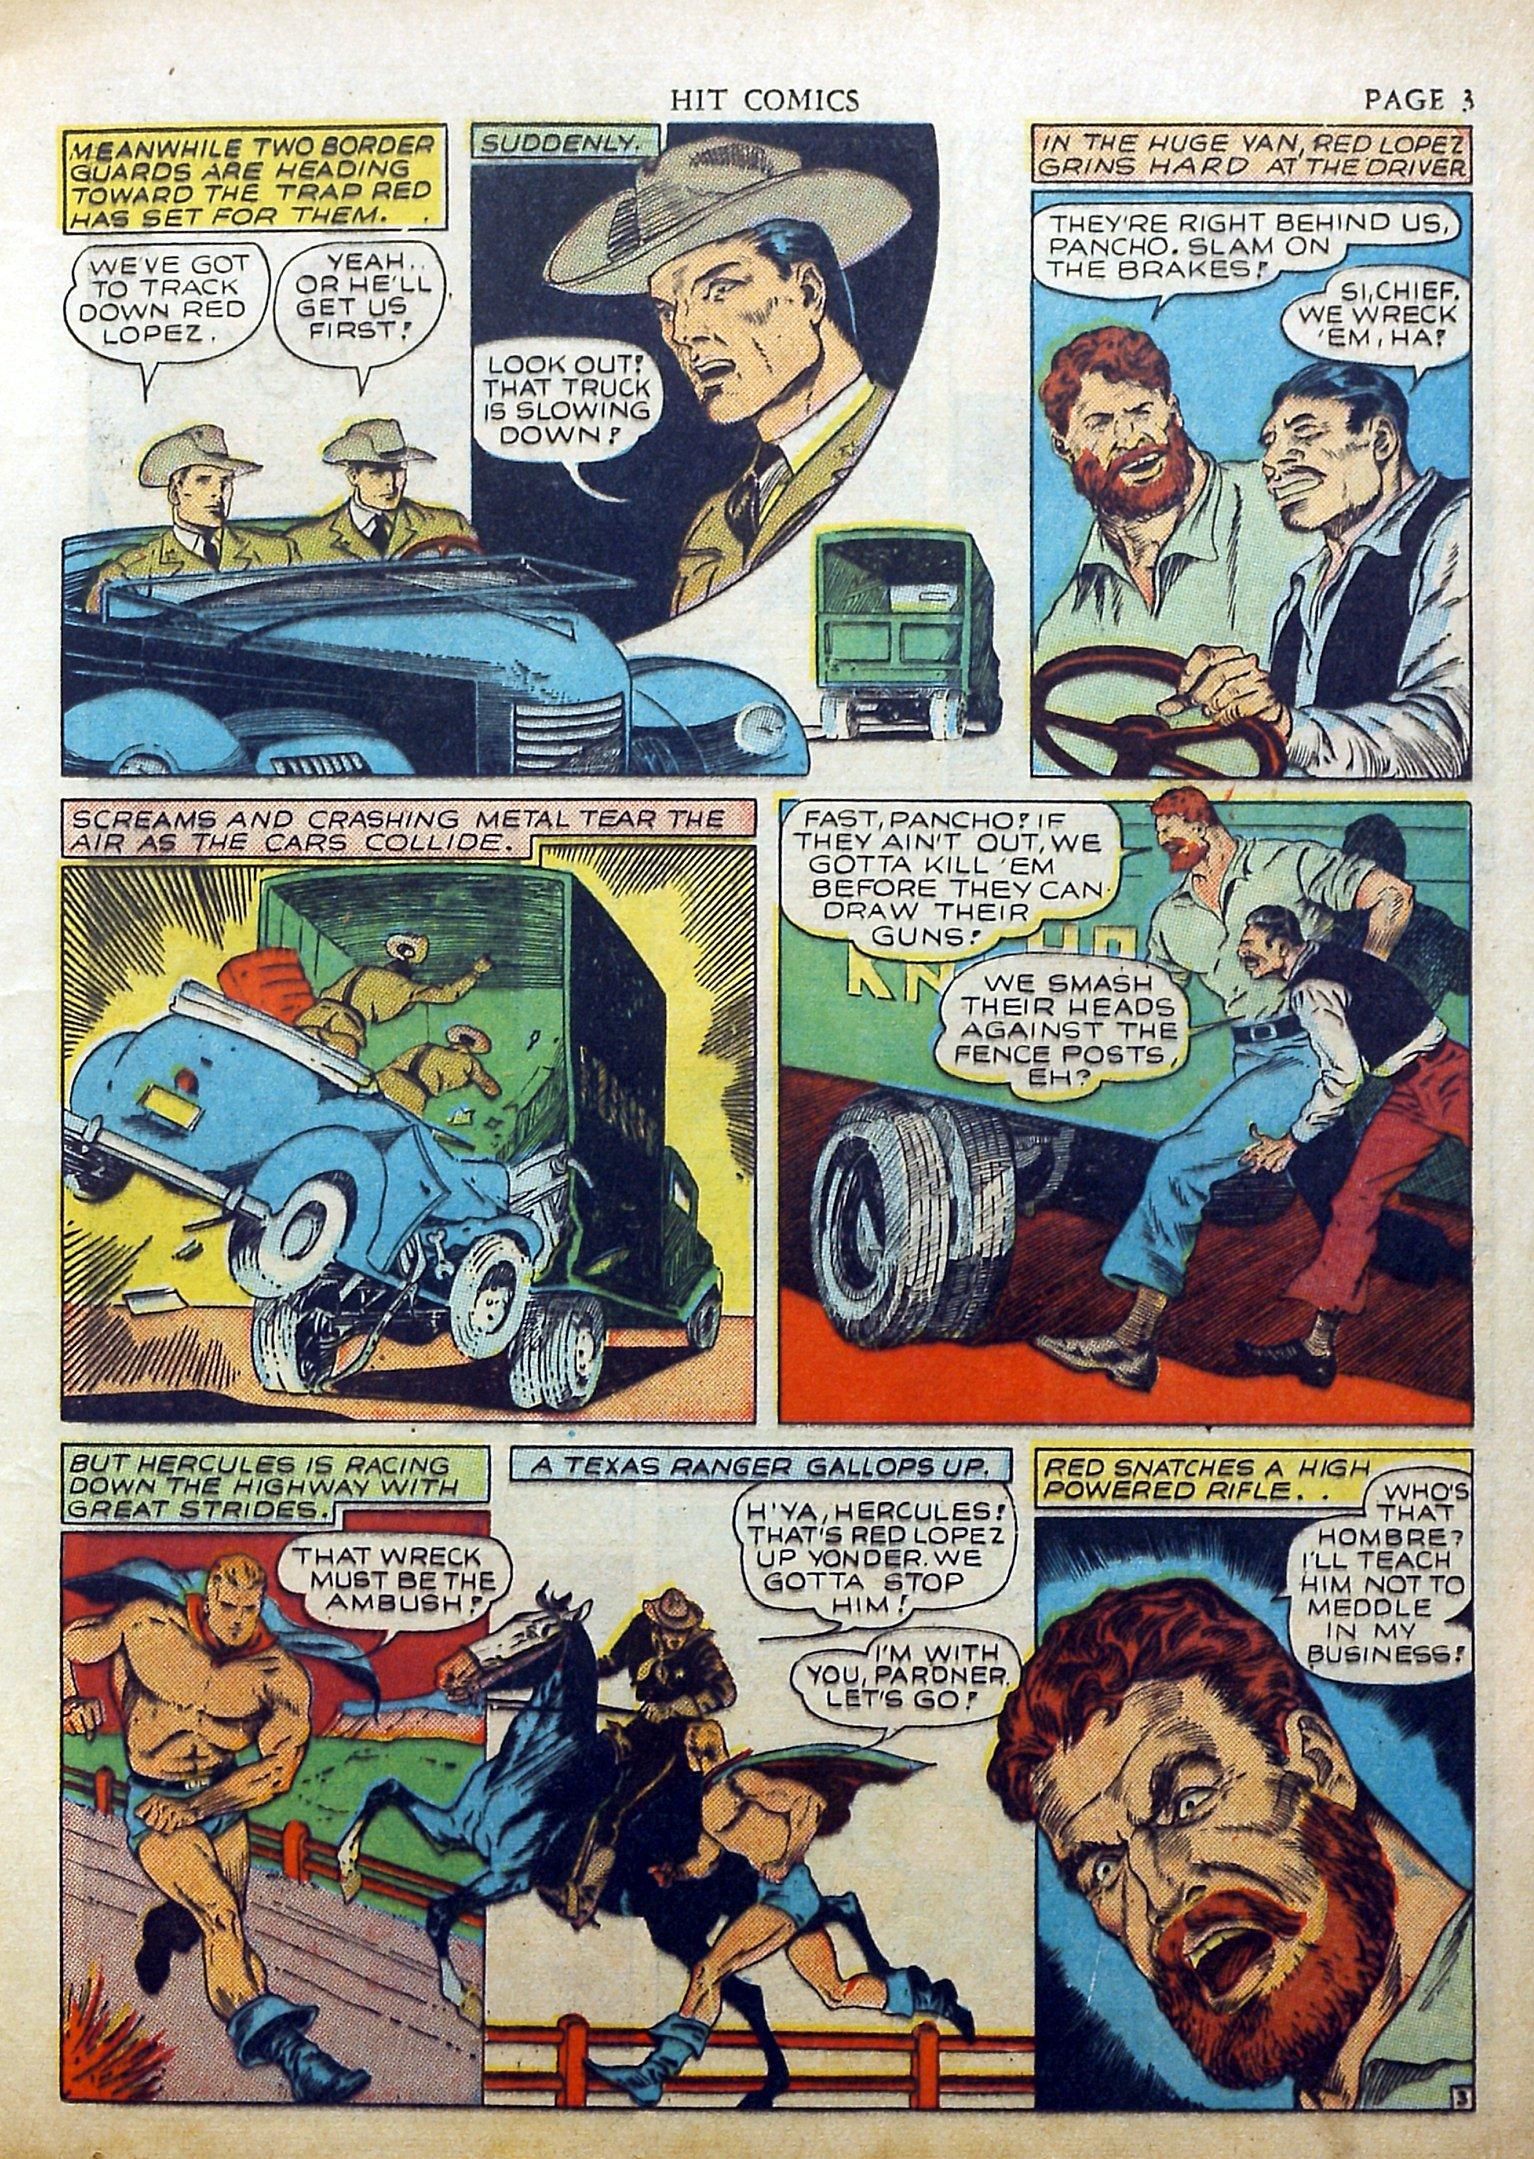 Read online Hit Comics comic -  Issue #17 - 5